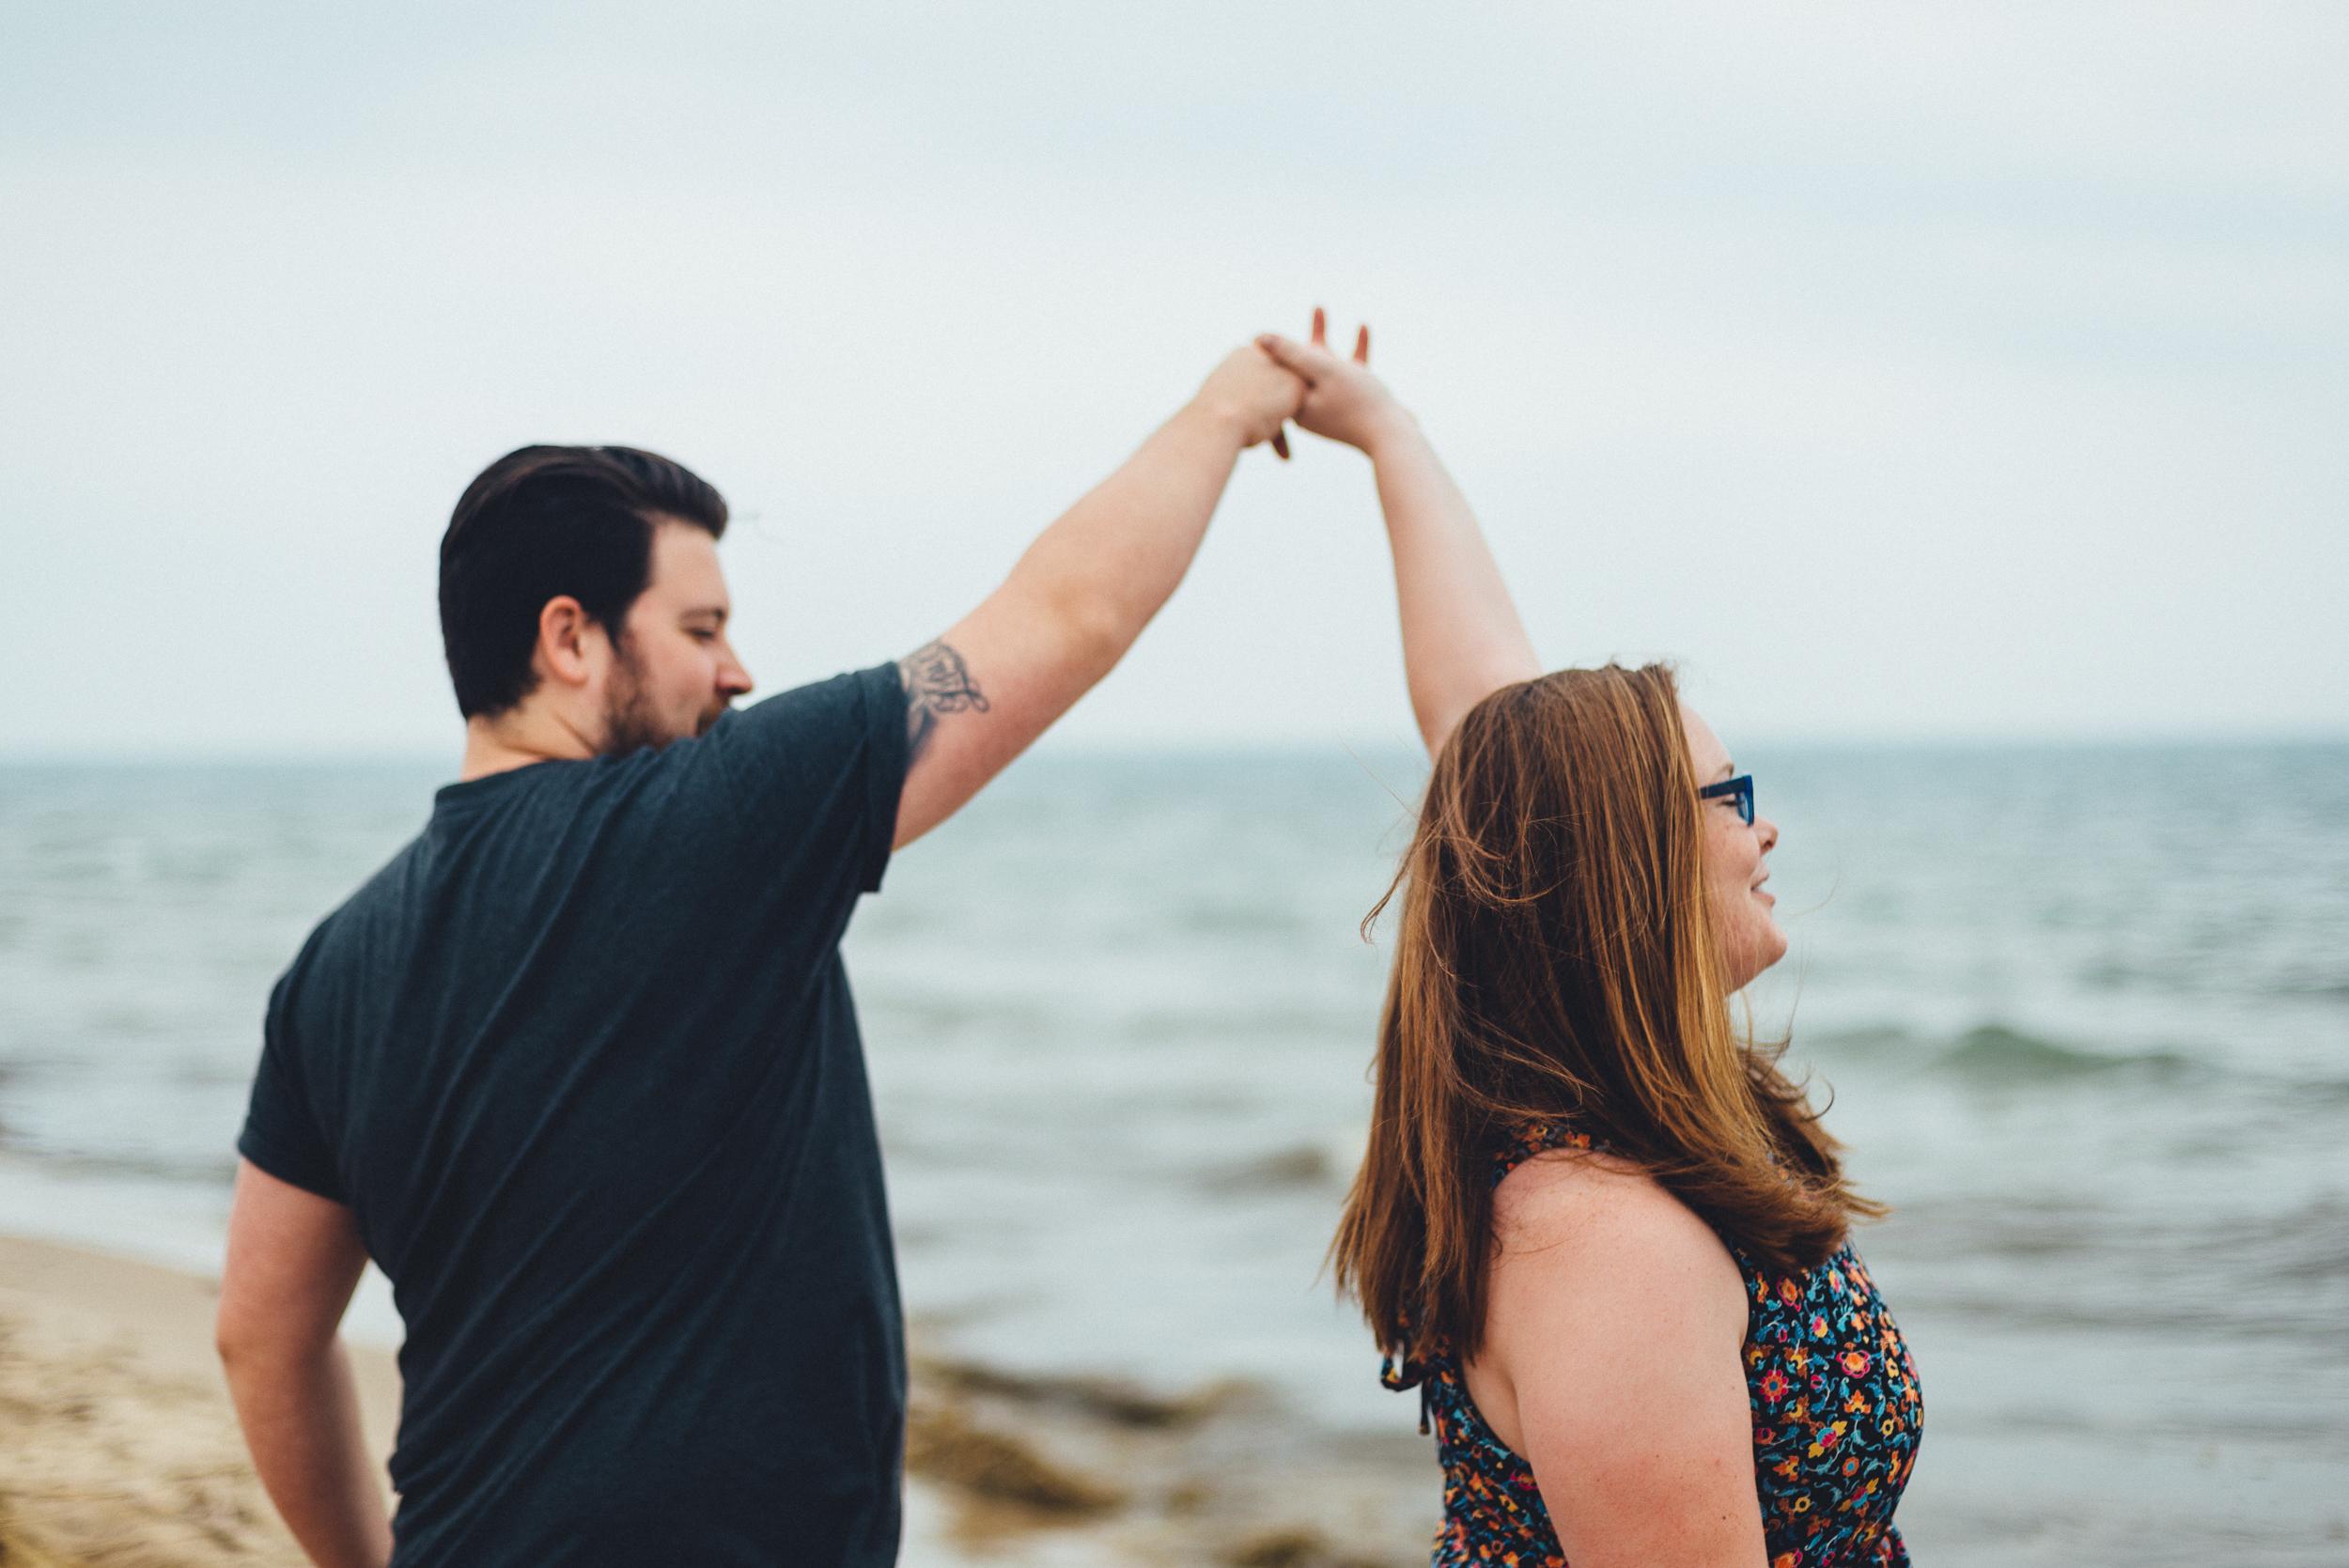 beach_couple_photography_engagment_love_long_island_photographer-10.jpg